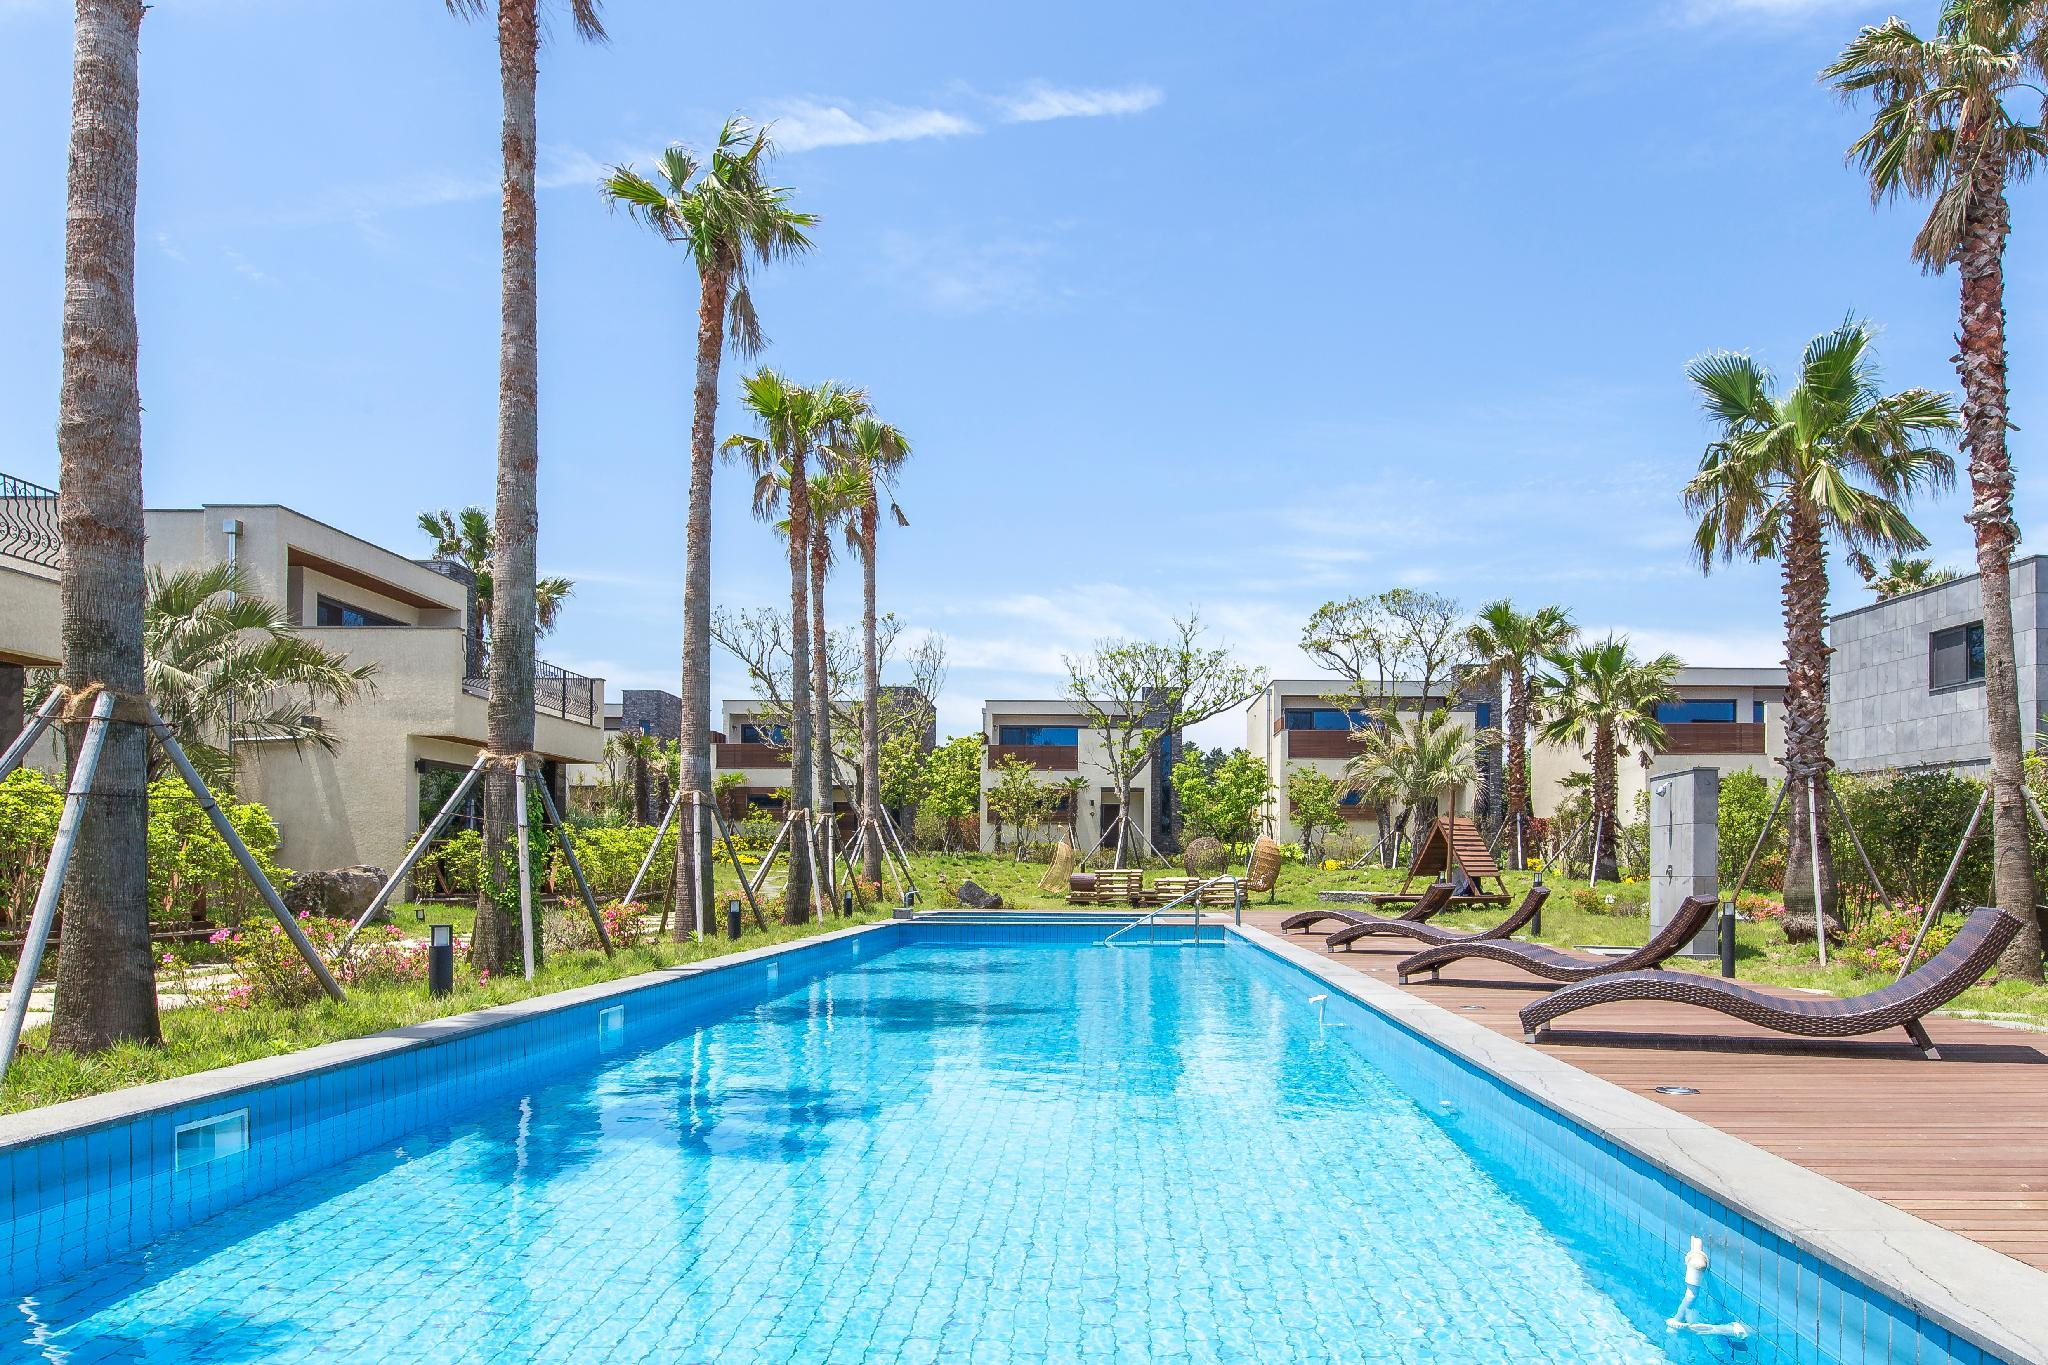 Leeum Island Spa & Pool villa Reviews